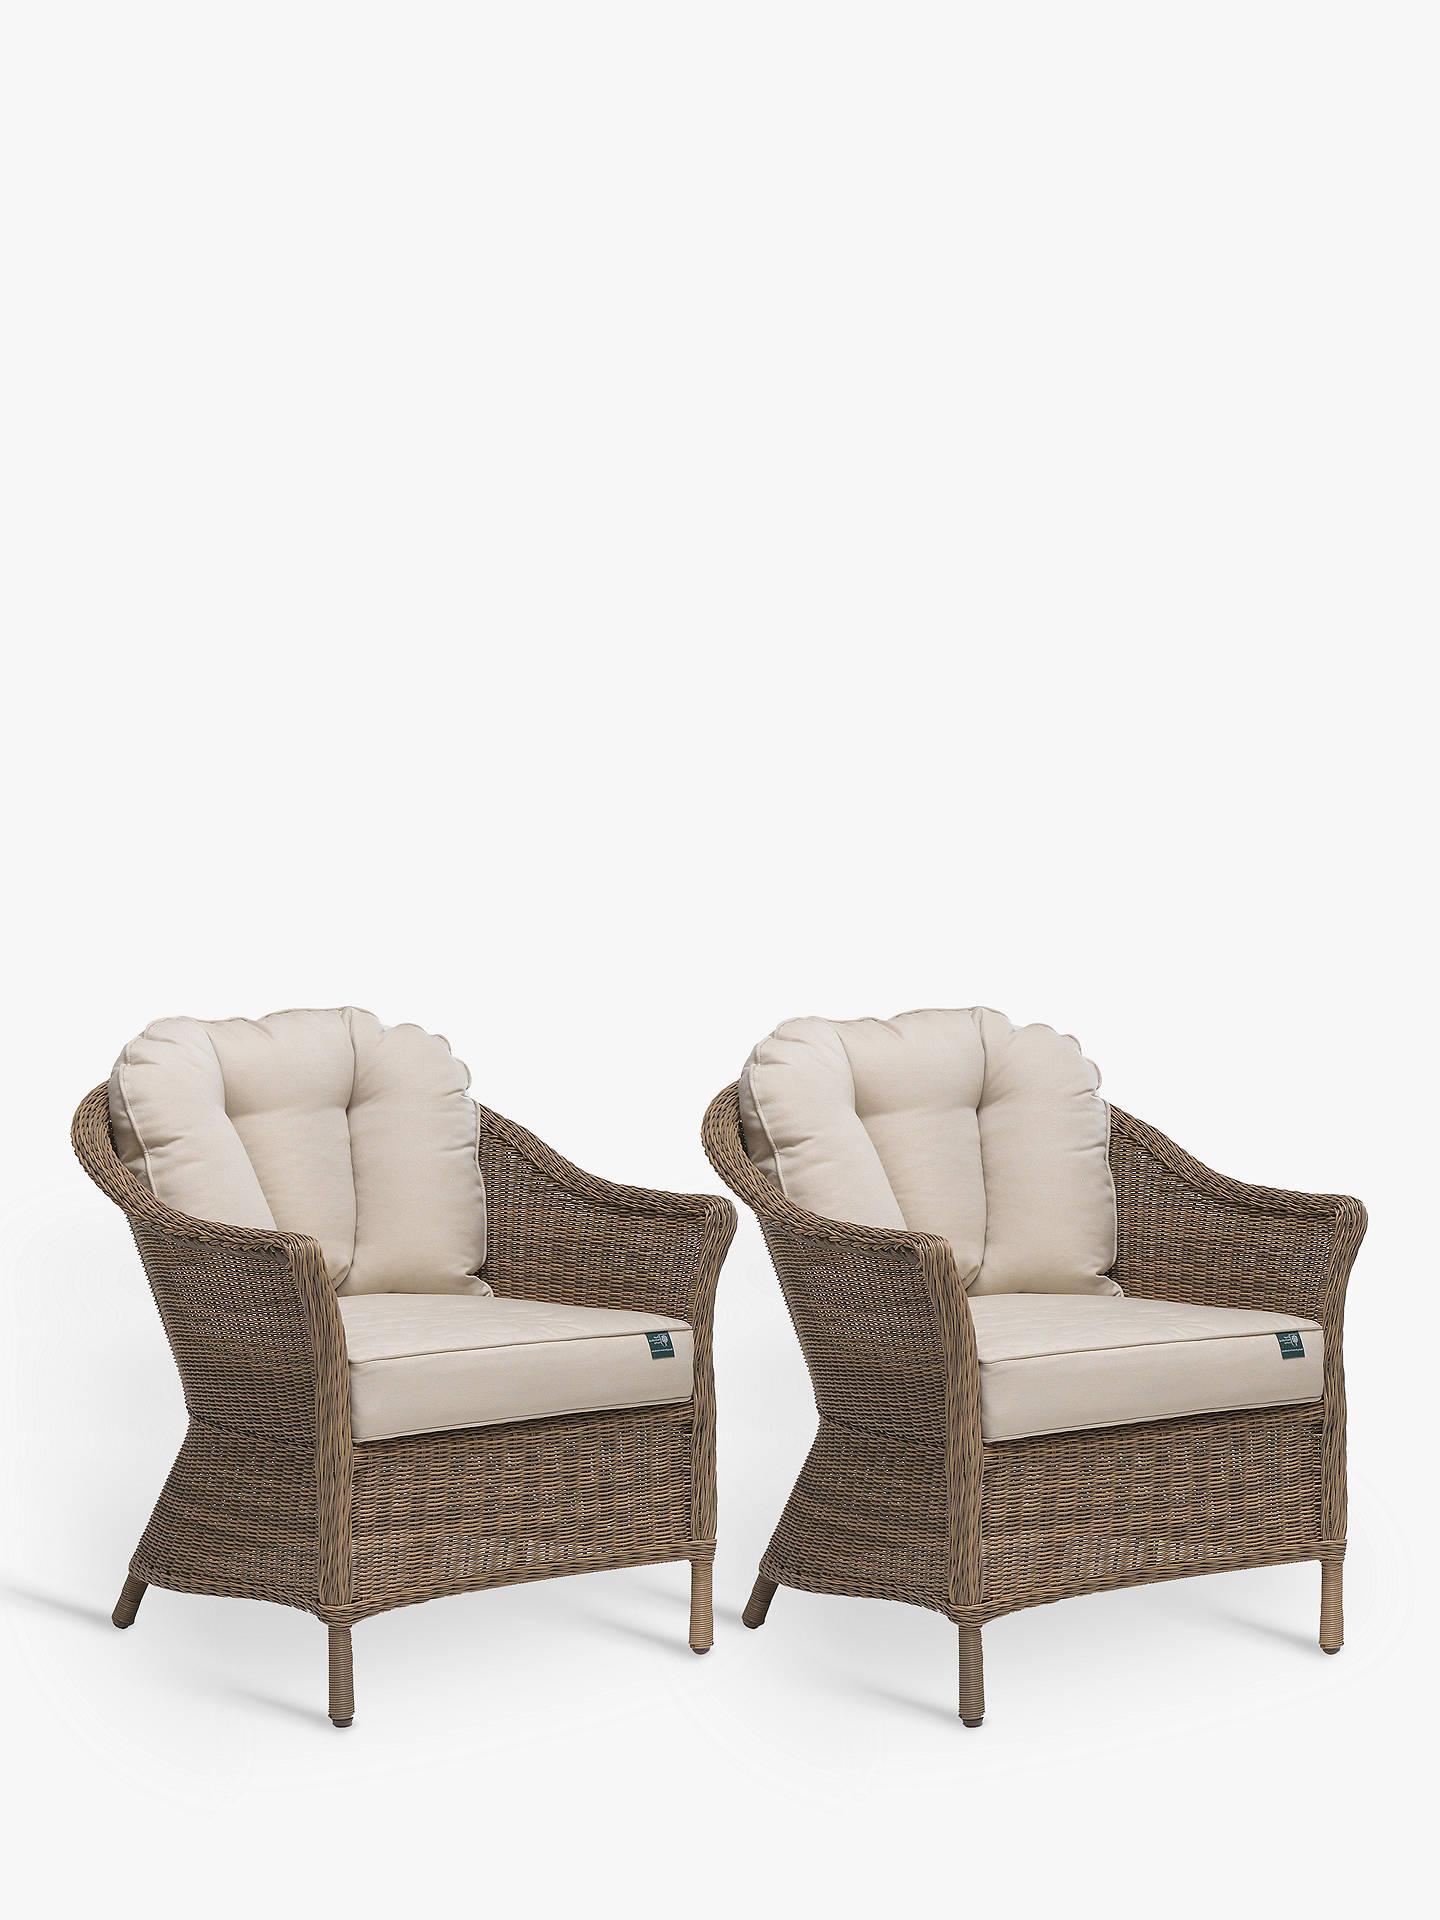 Kettler Rhs Harlow Carr Lounging Armchair Set Of 2 Natural At John